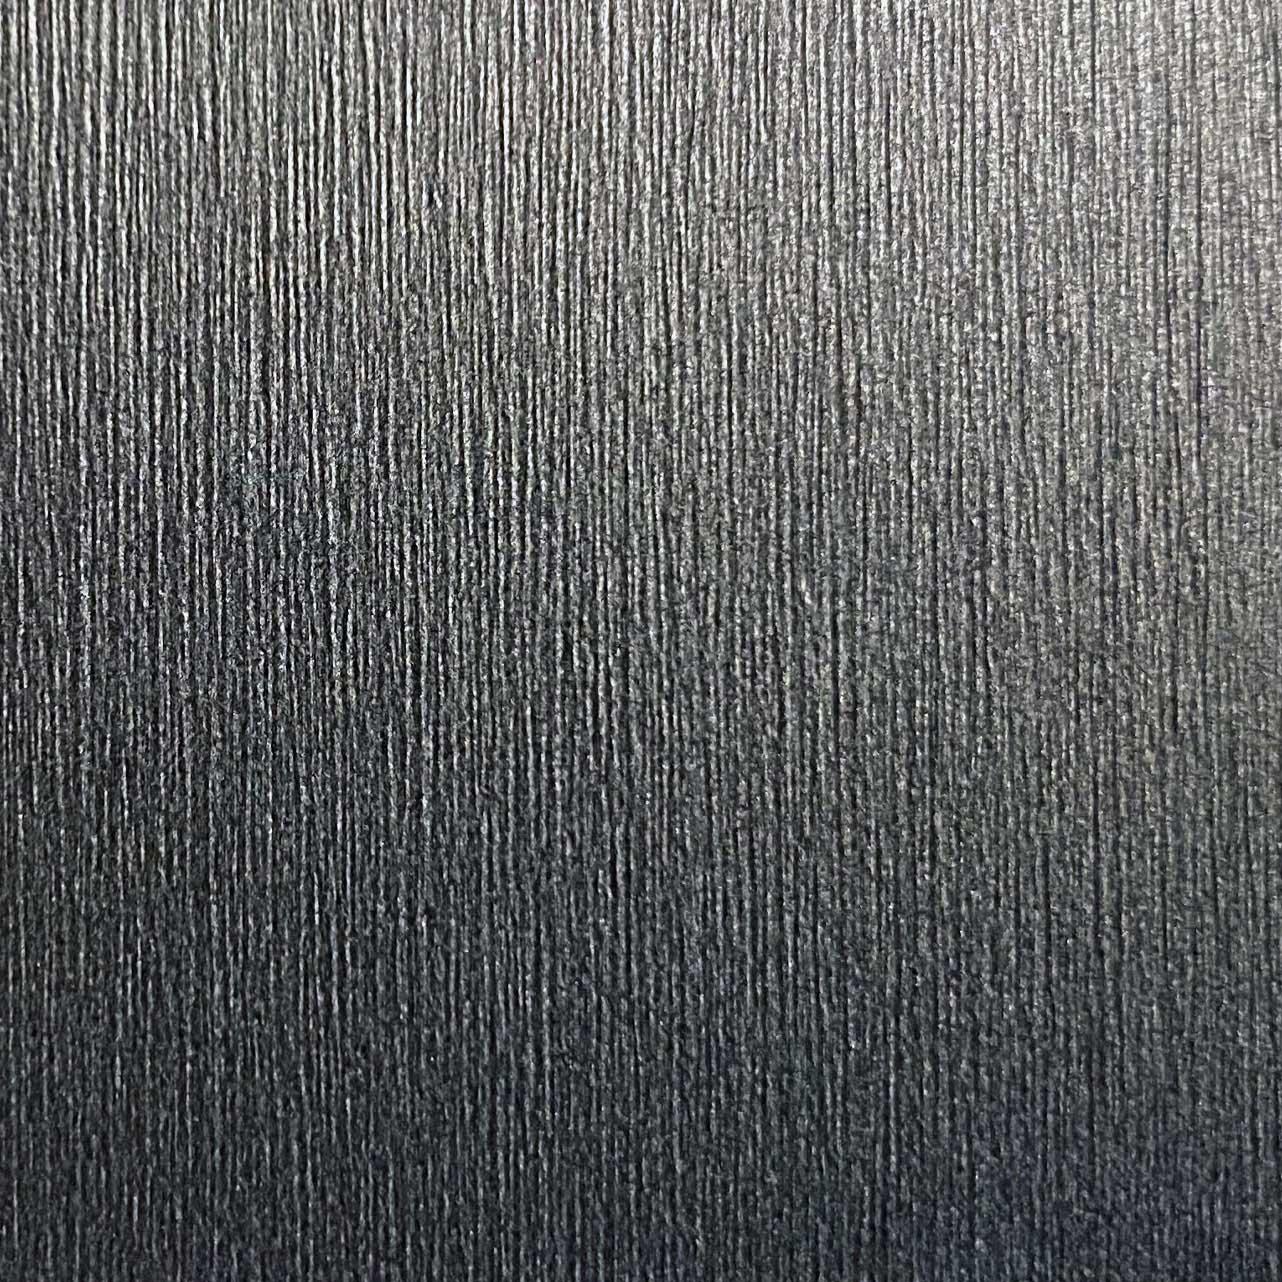 Q50 Dark Brushed Silver